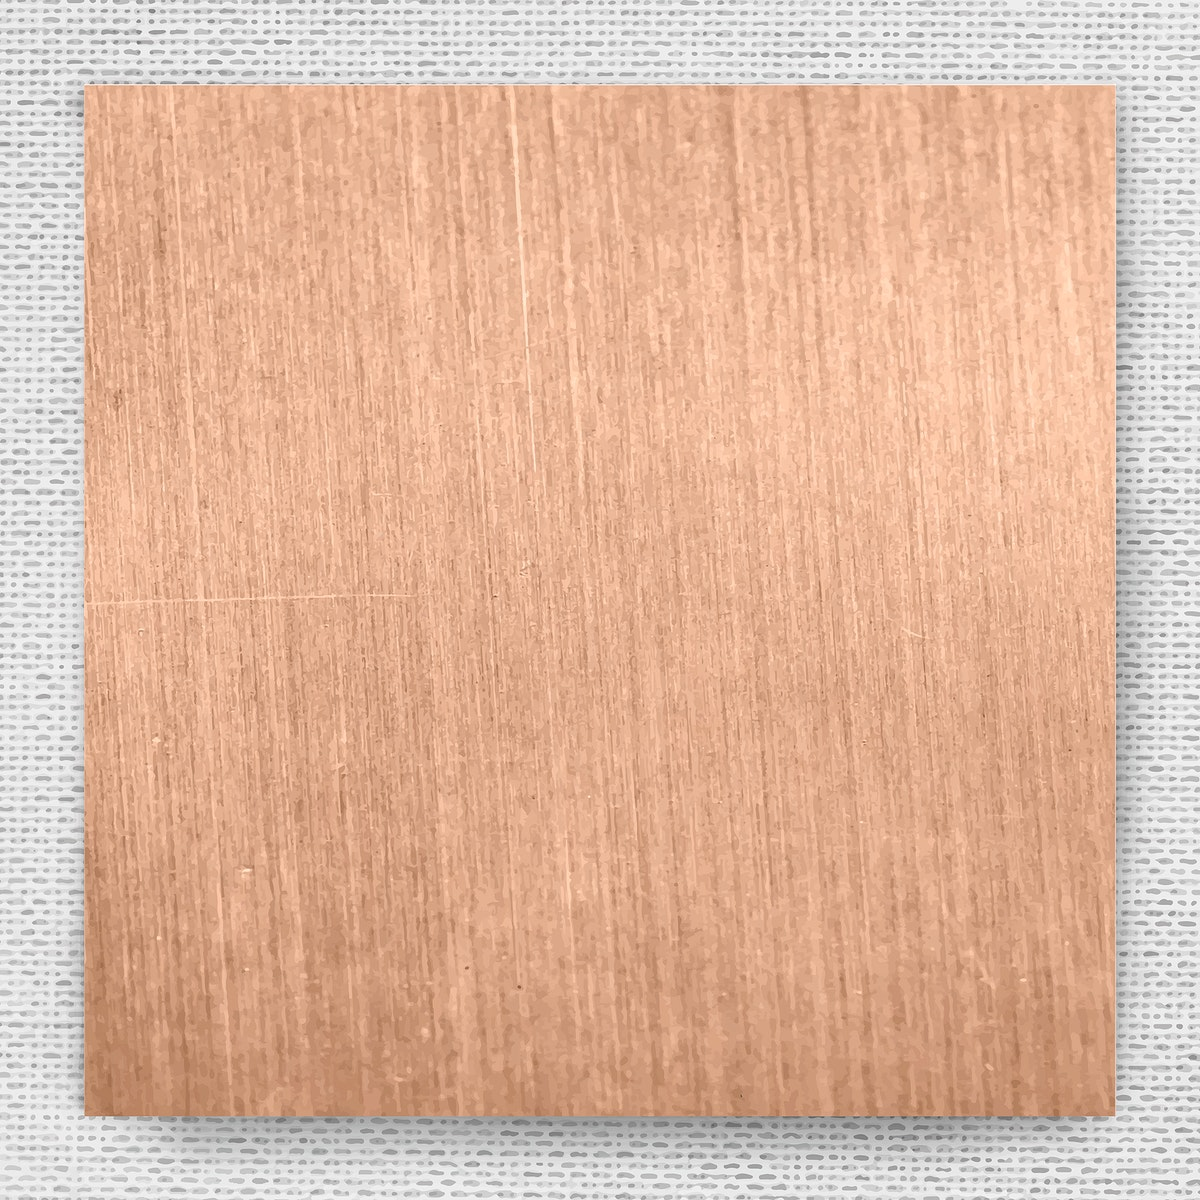 Brown wooden textured background vector